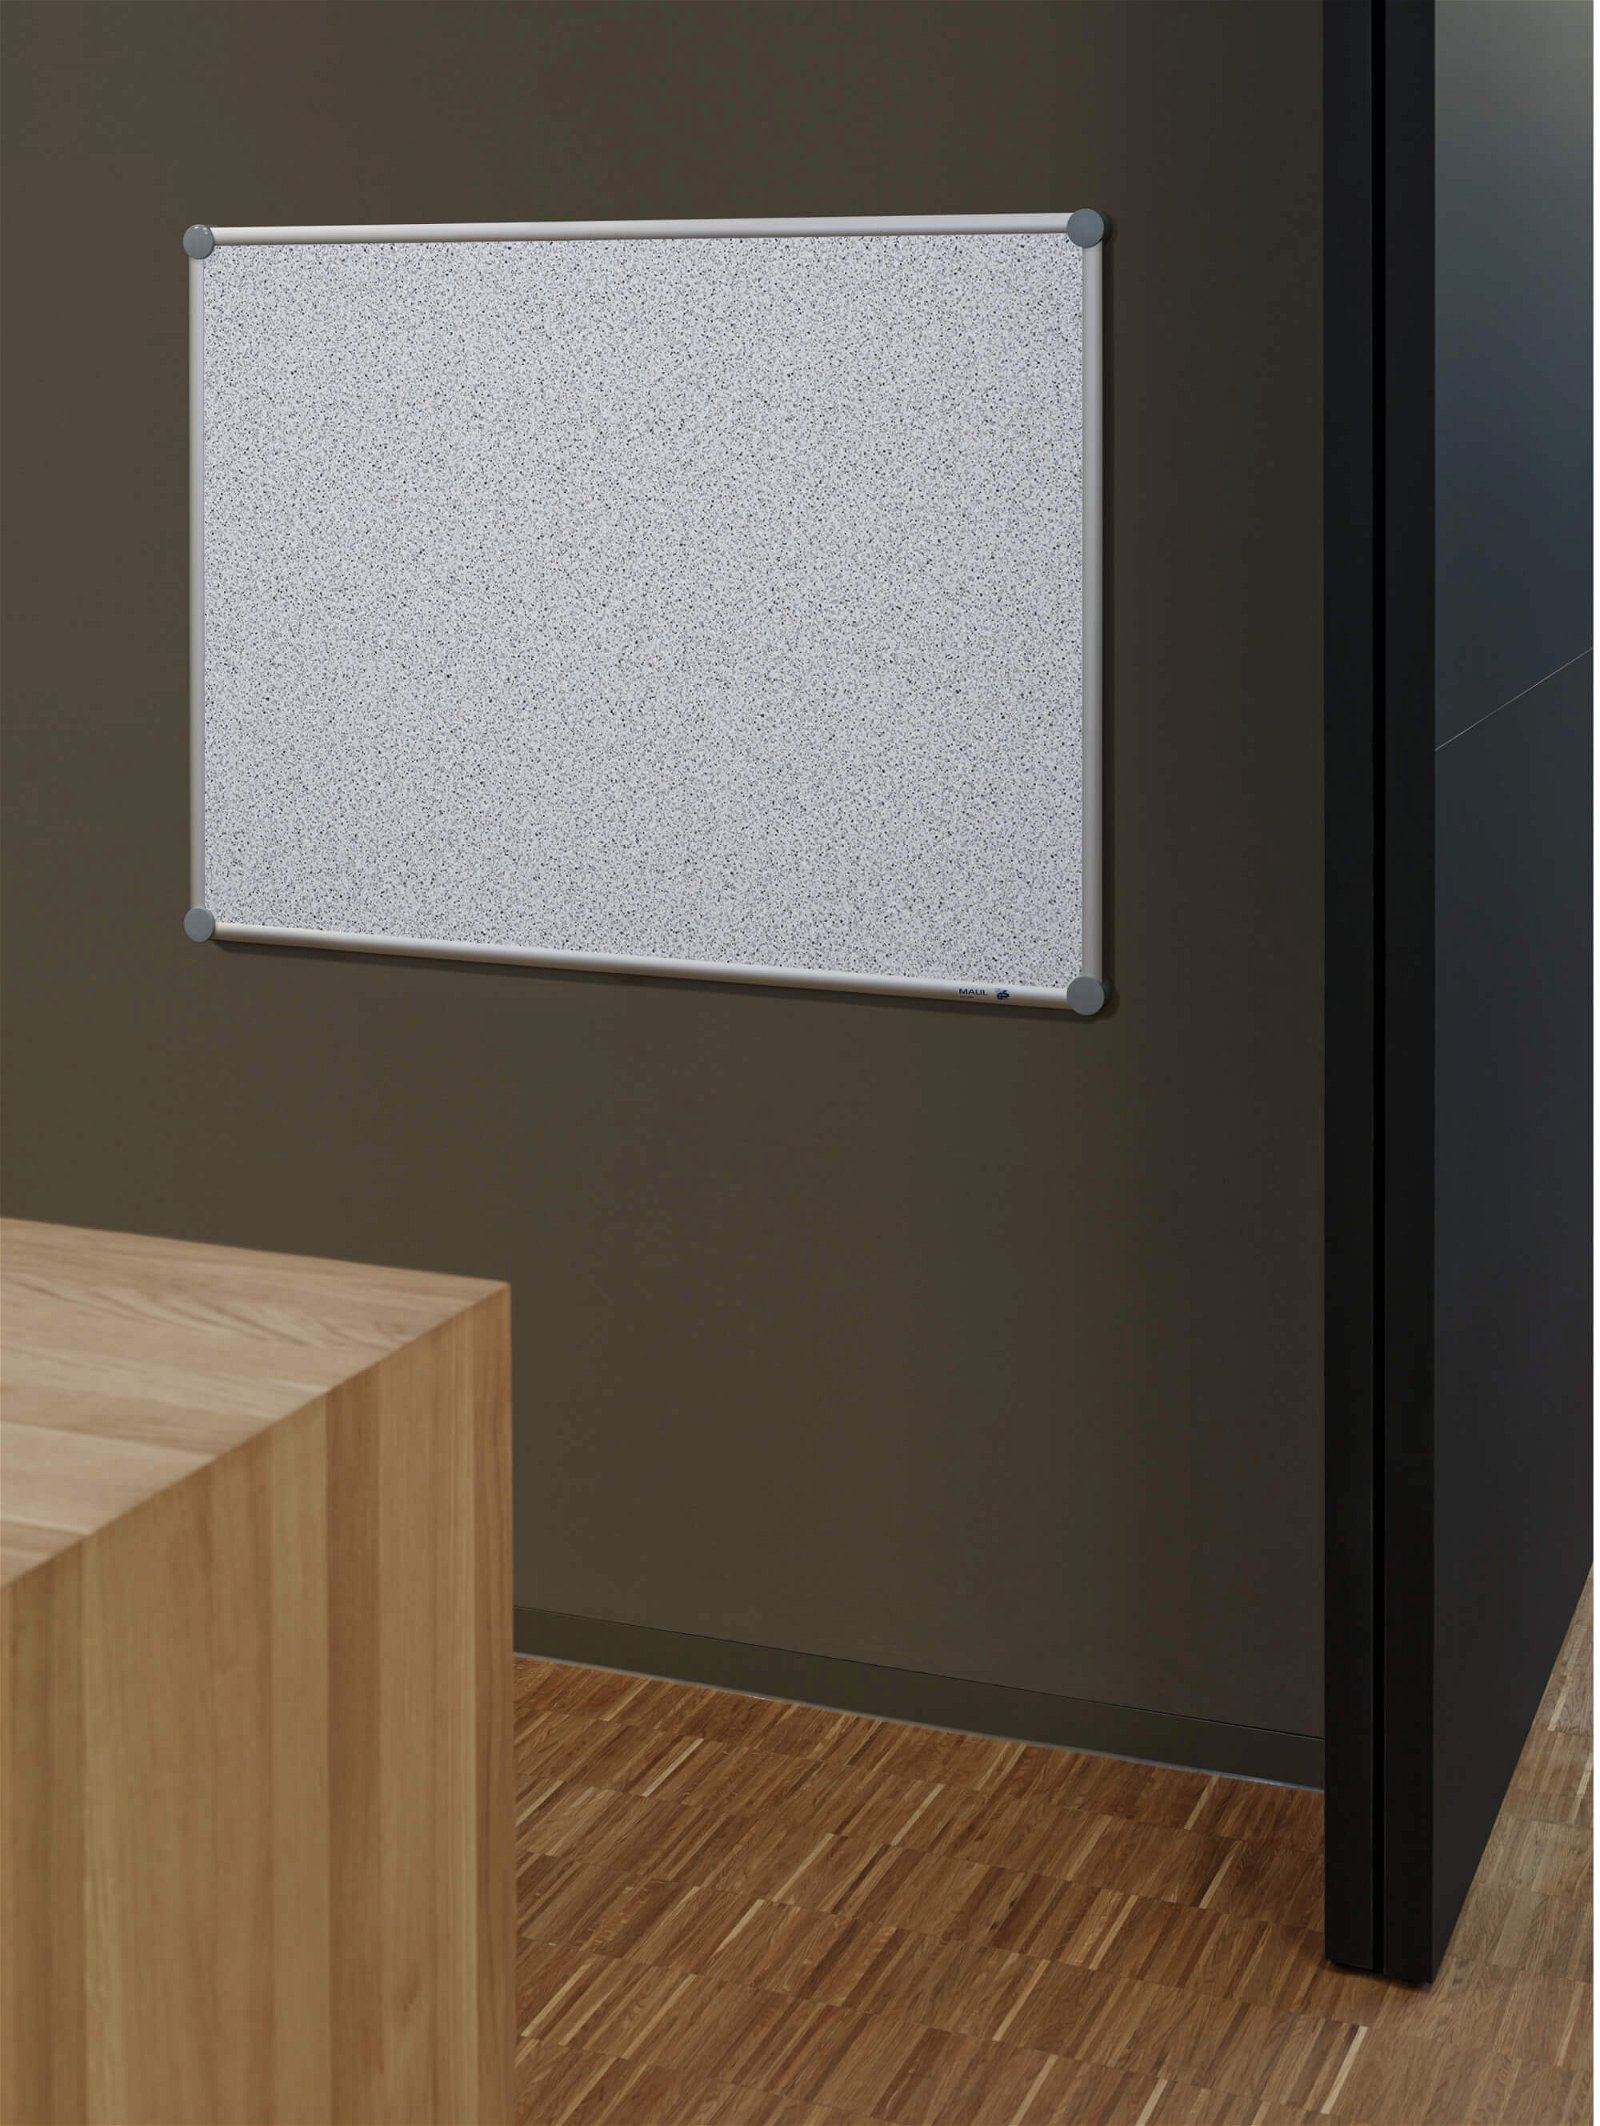 Pinnboard 2000 MAULpro, Struktur, 60x90 cm, grau